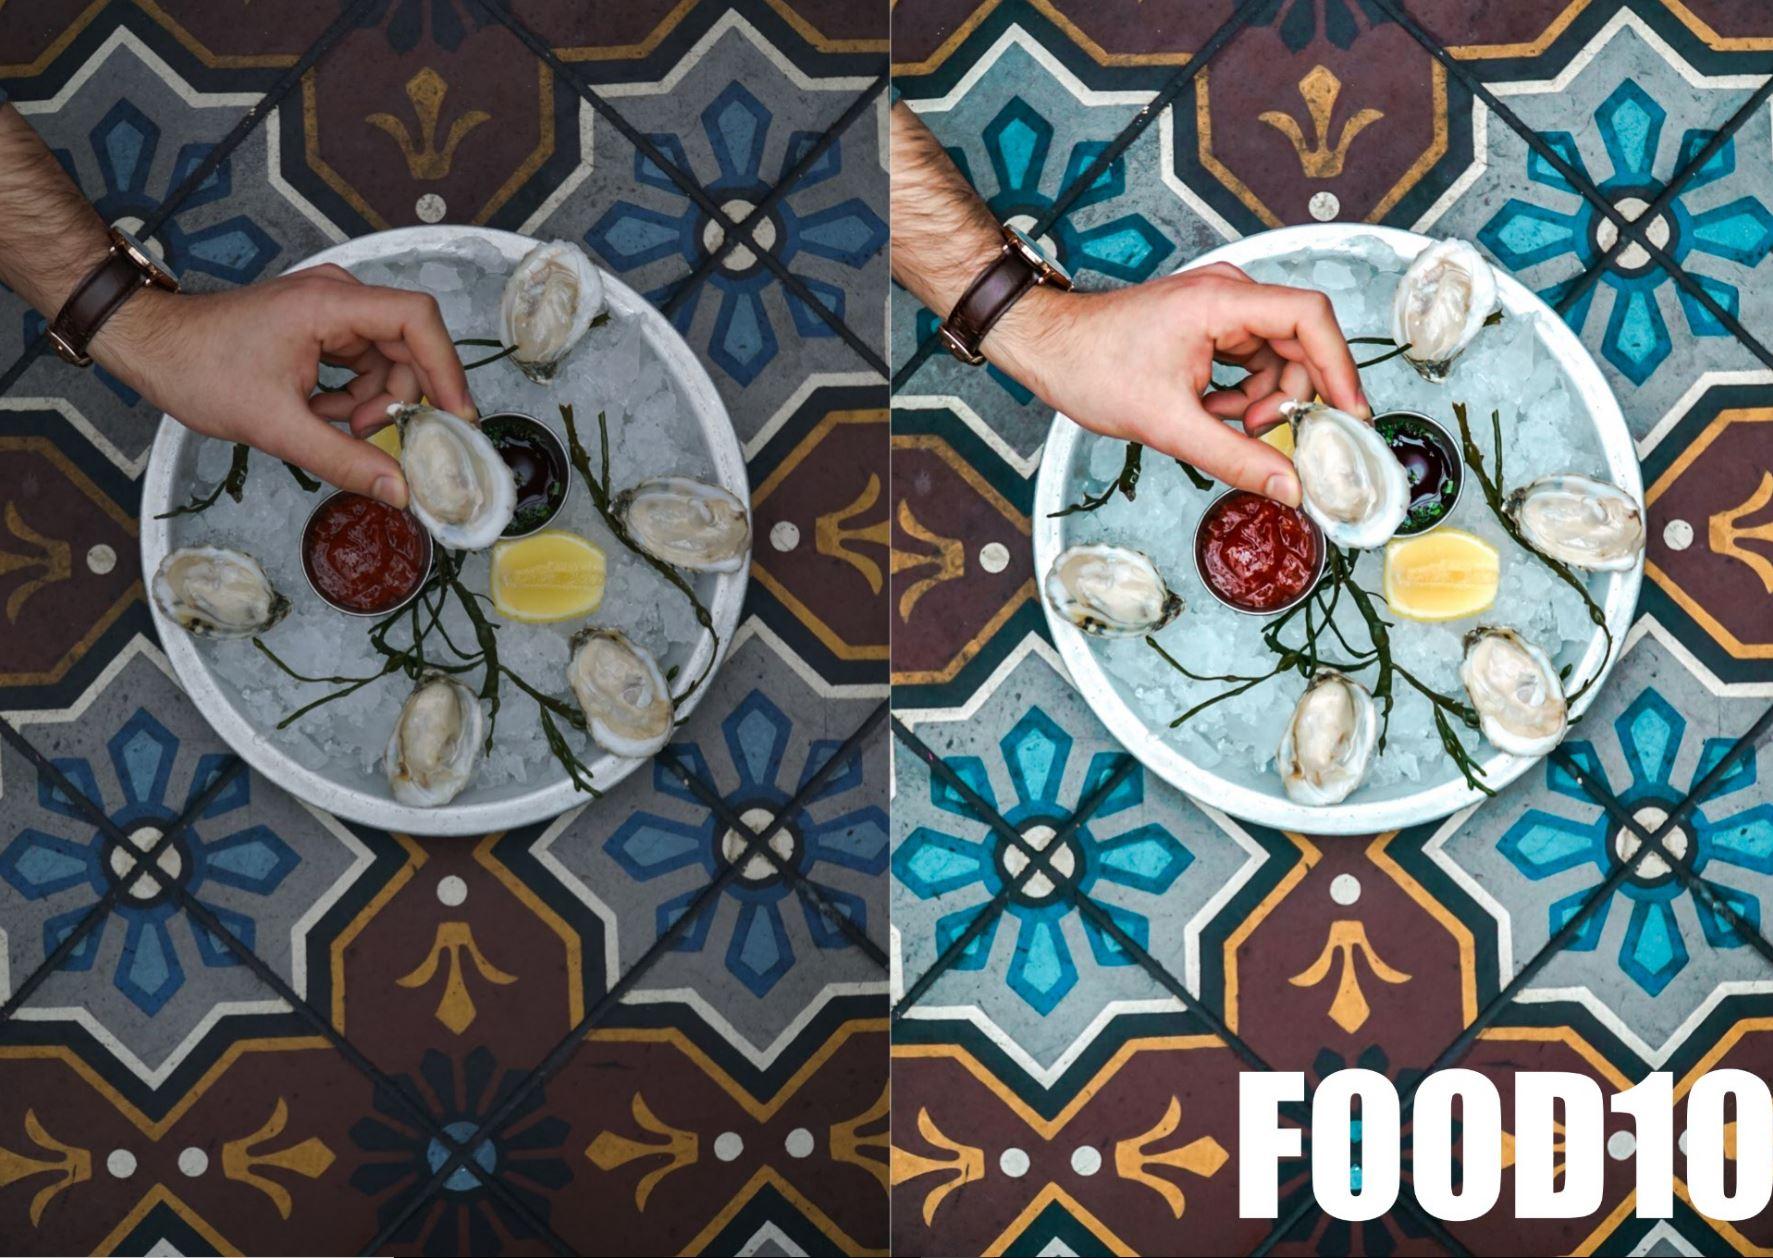 FOOD10redo.JPG